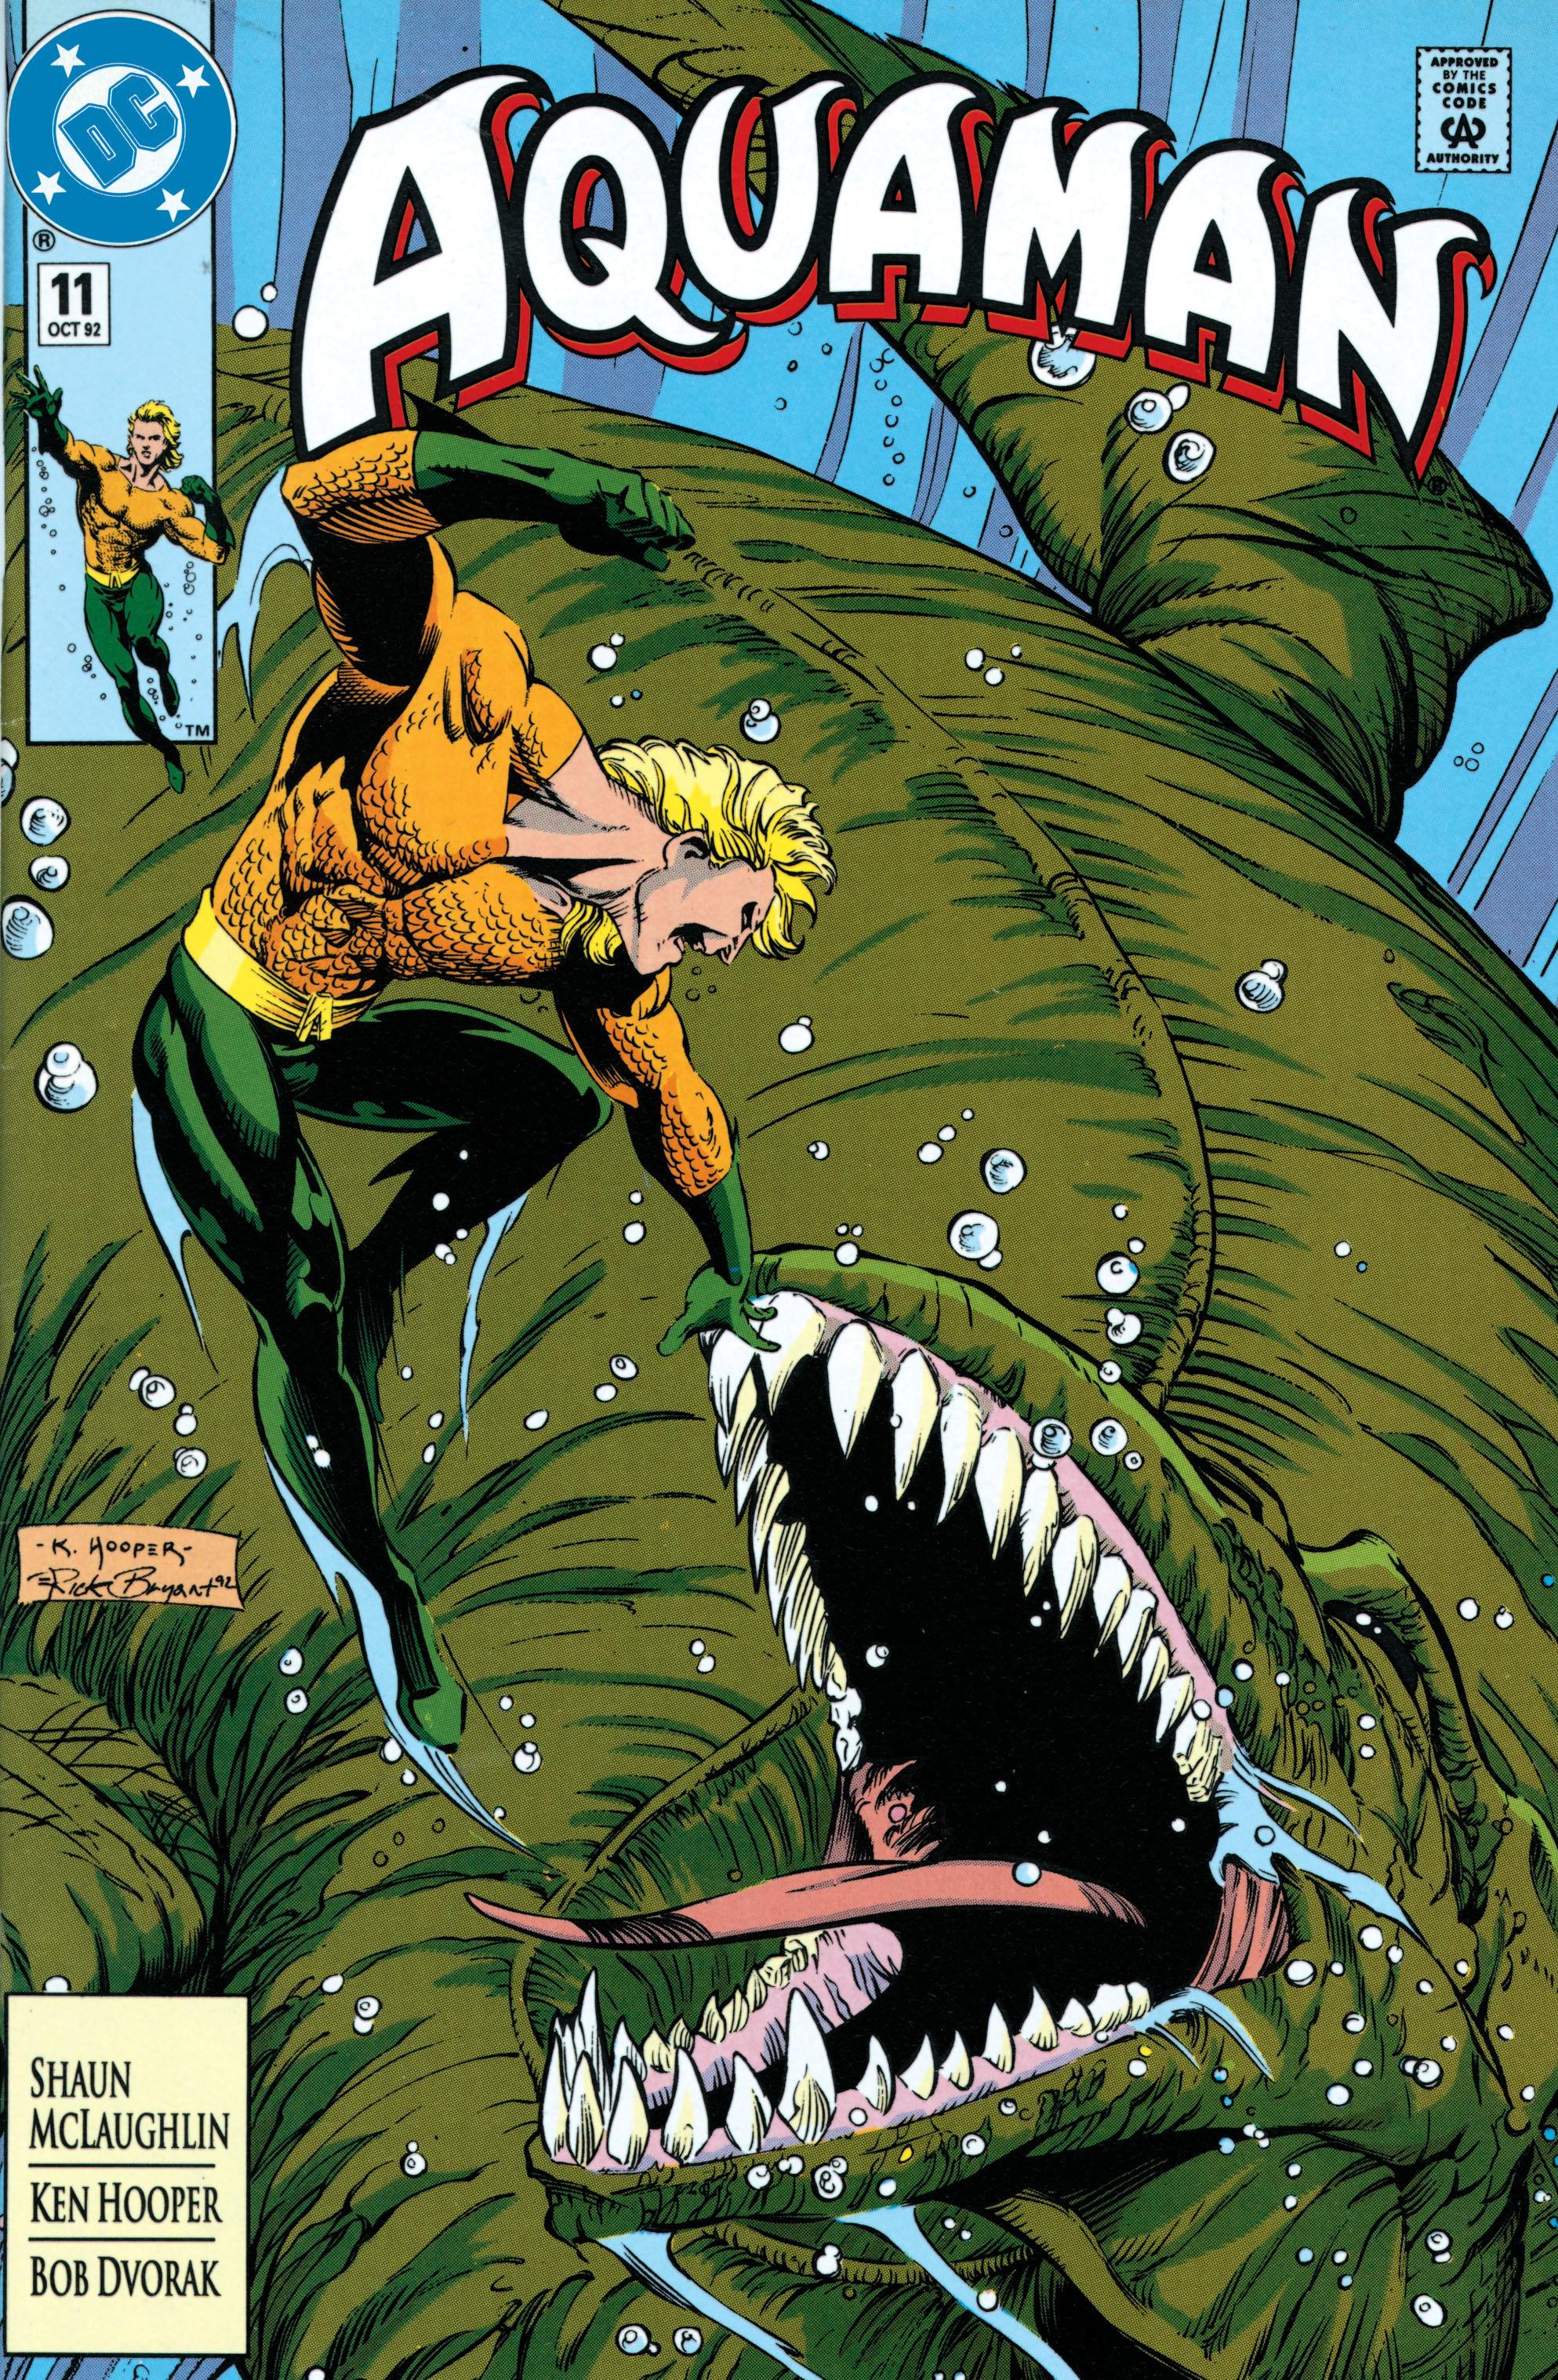 Read online Aquaman (1991) comic -  Issue #11 - 1